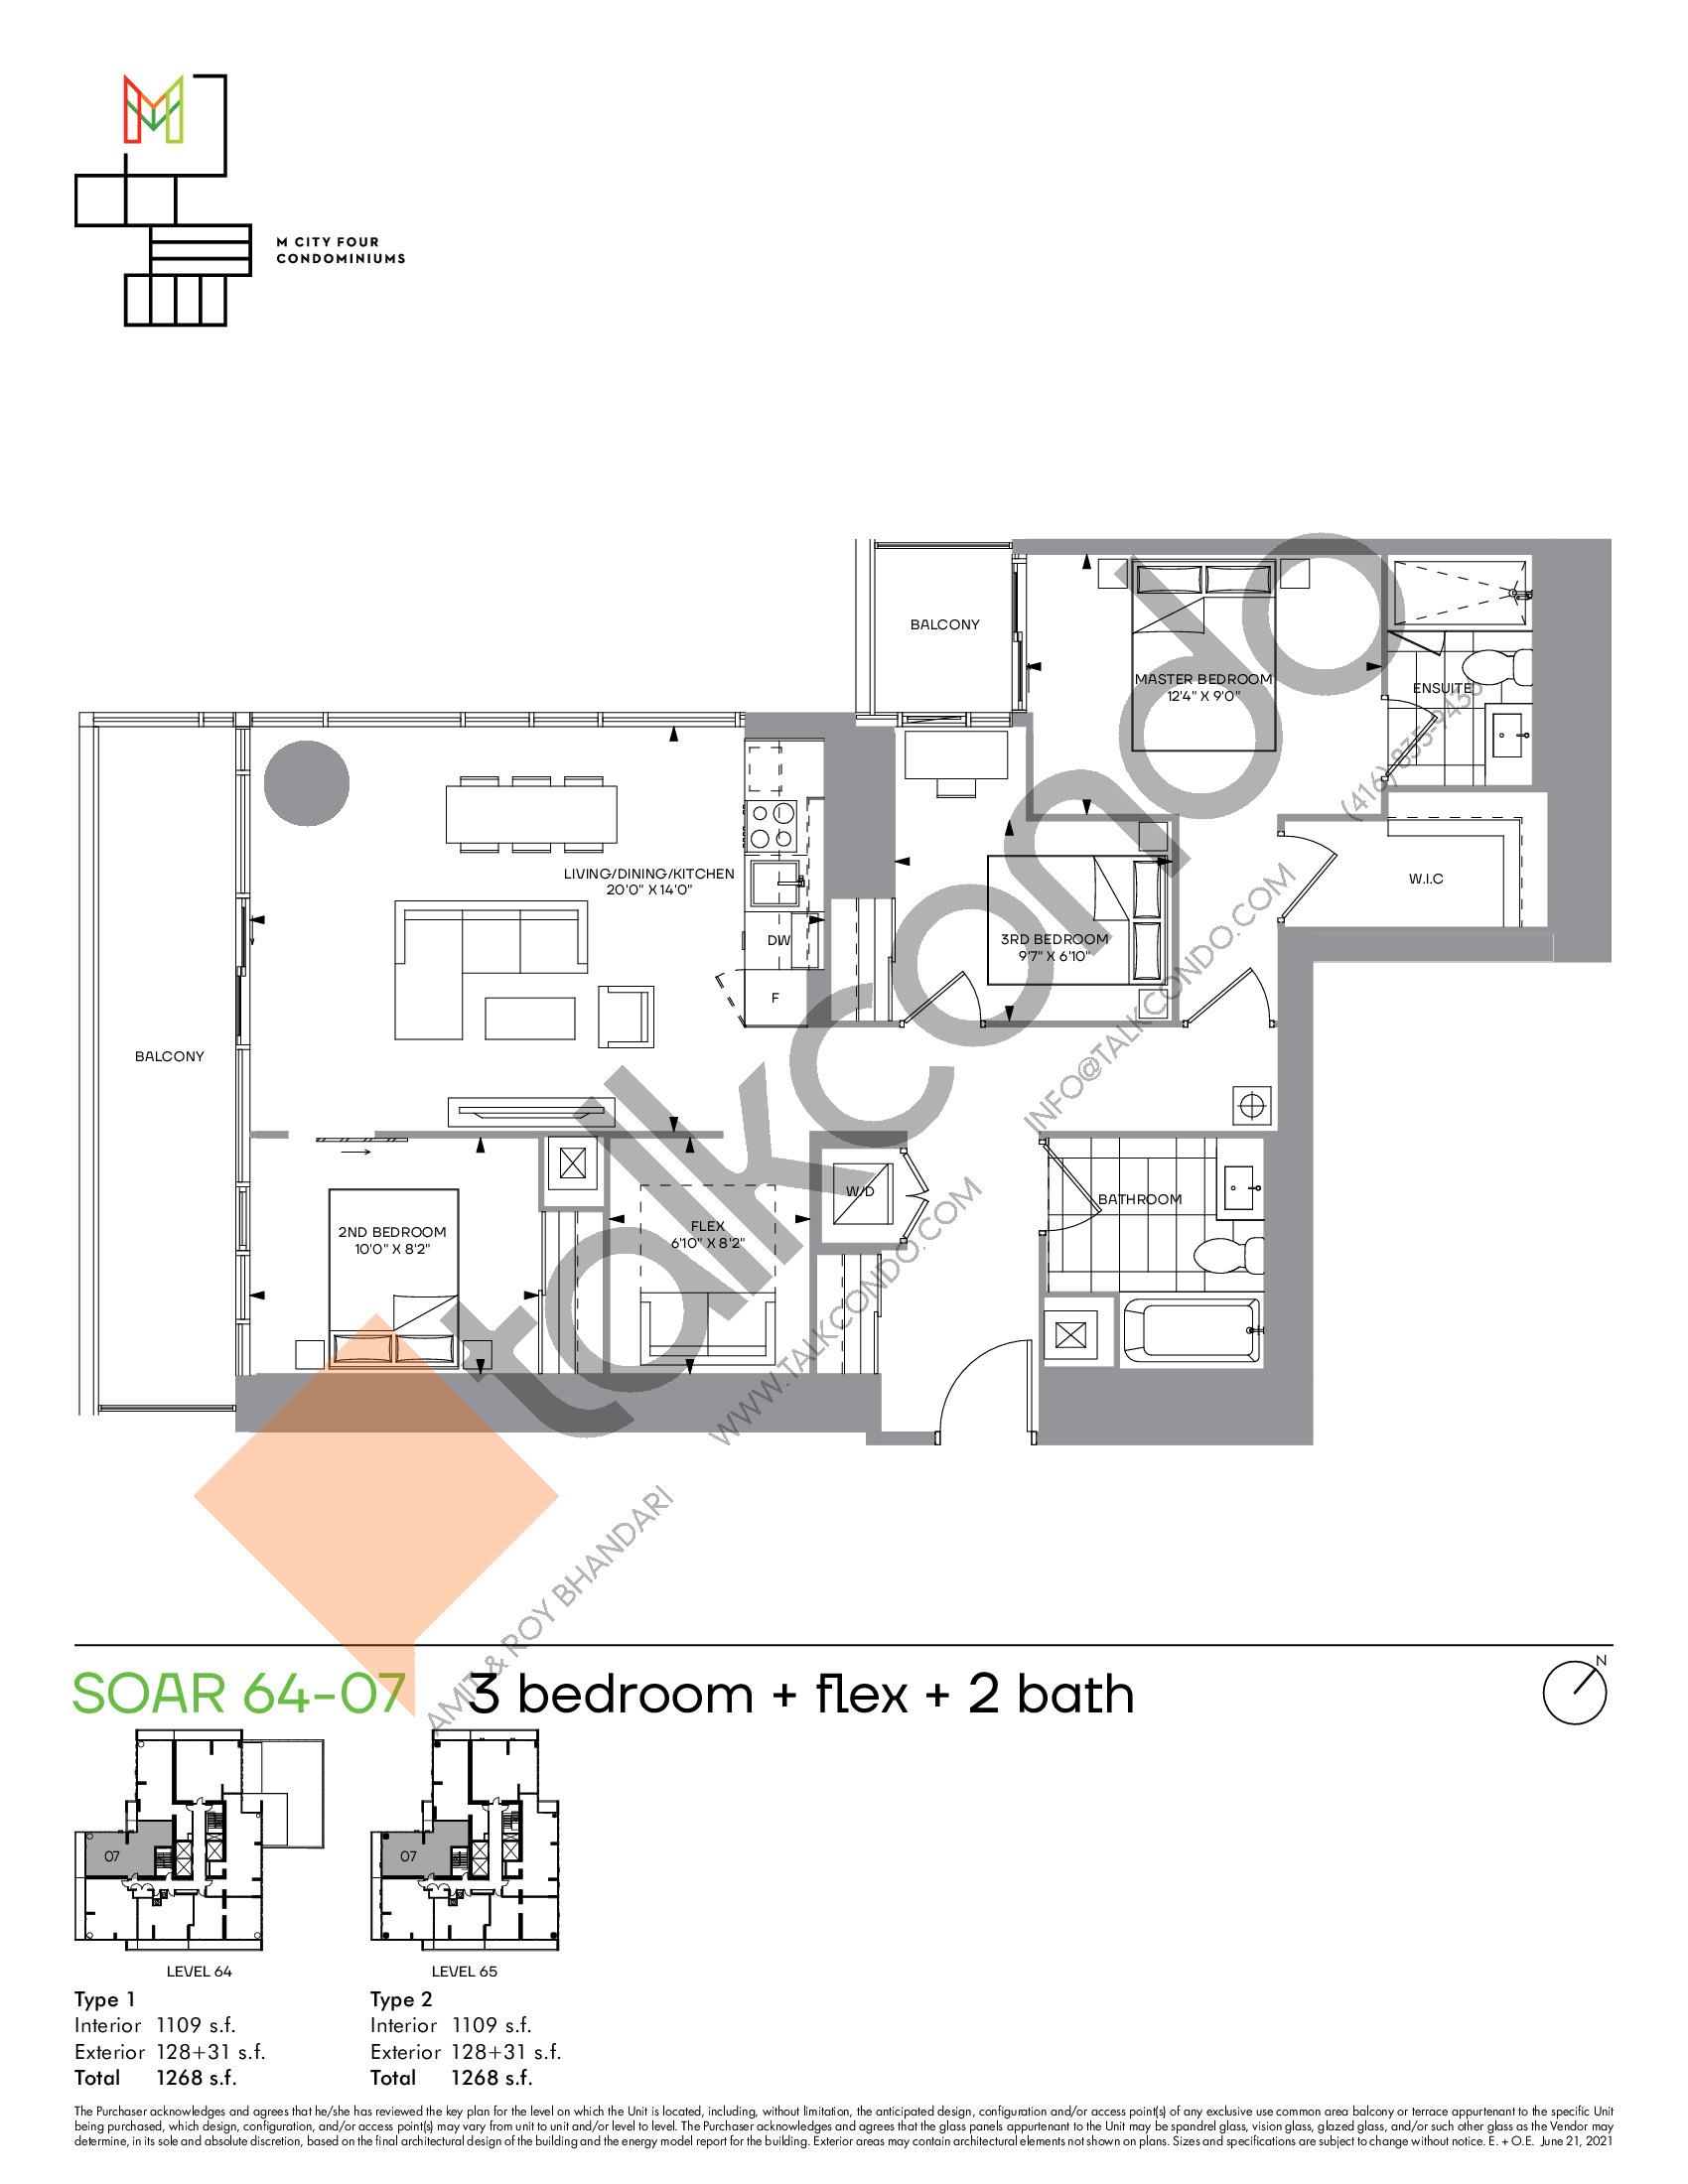 Soar 64-07 Floor Plan at M4 Condos - 1109 sq.ft